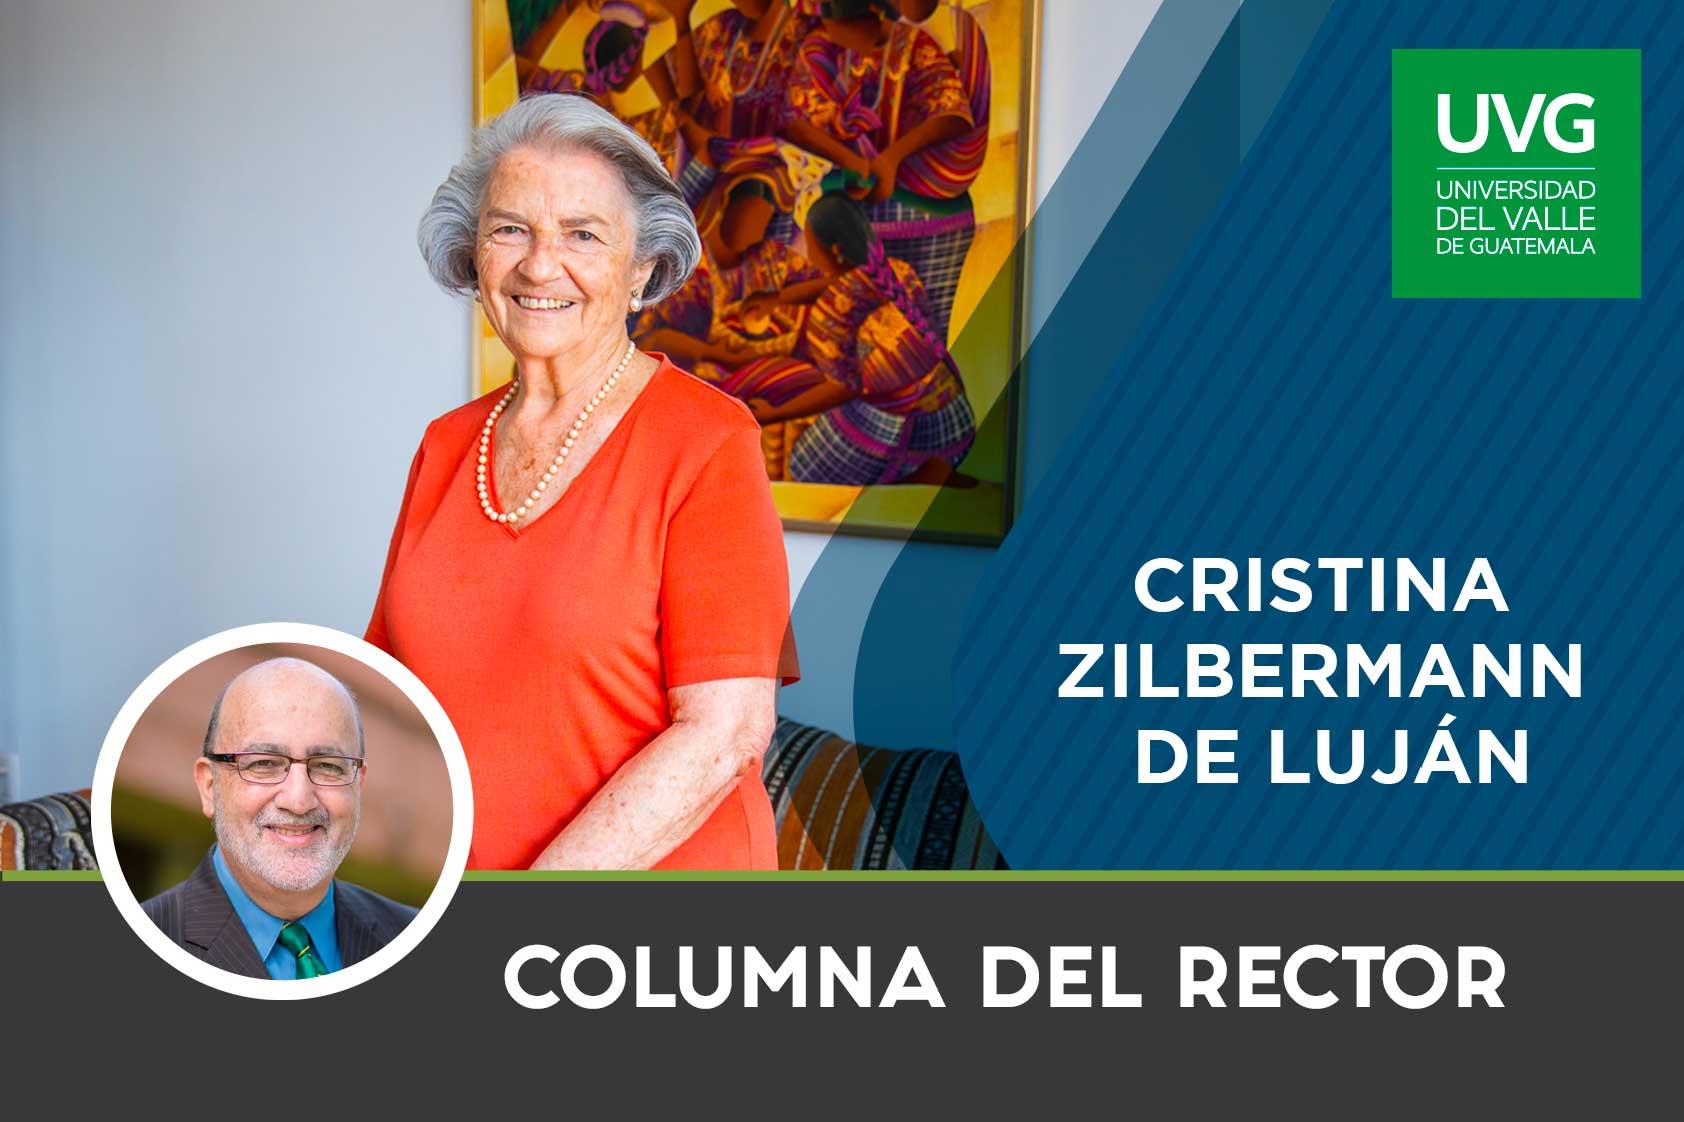 Cristina Zilbermann de Luján